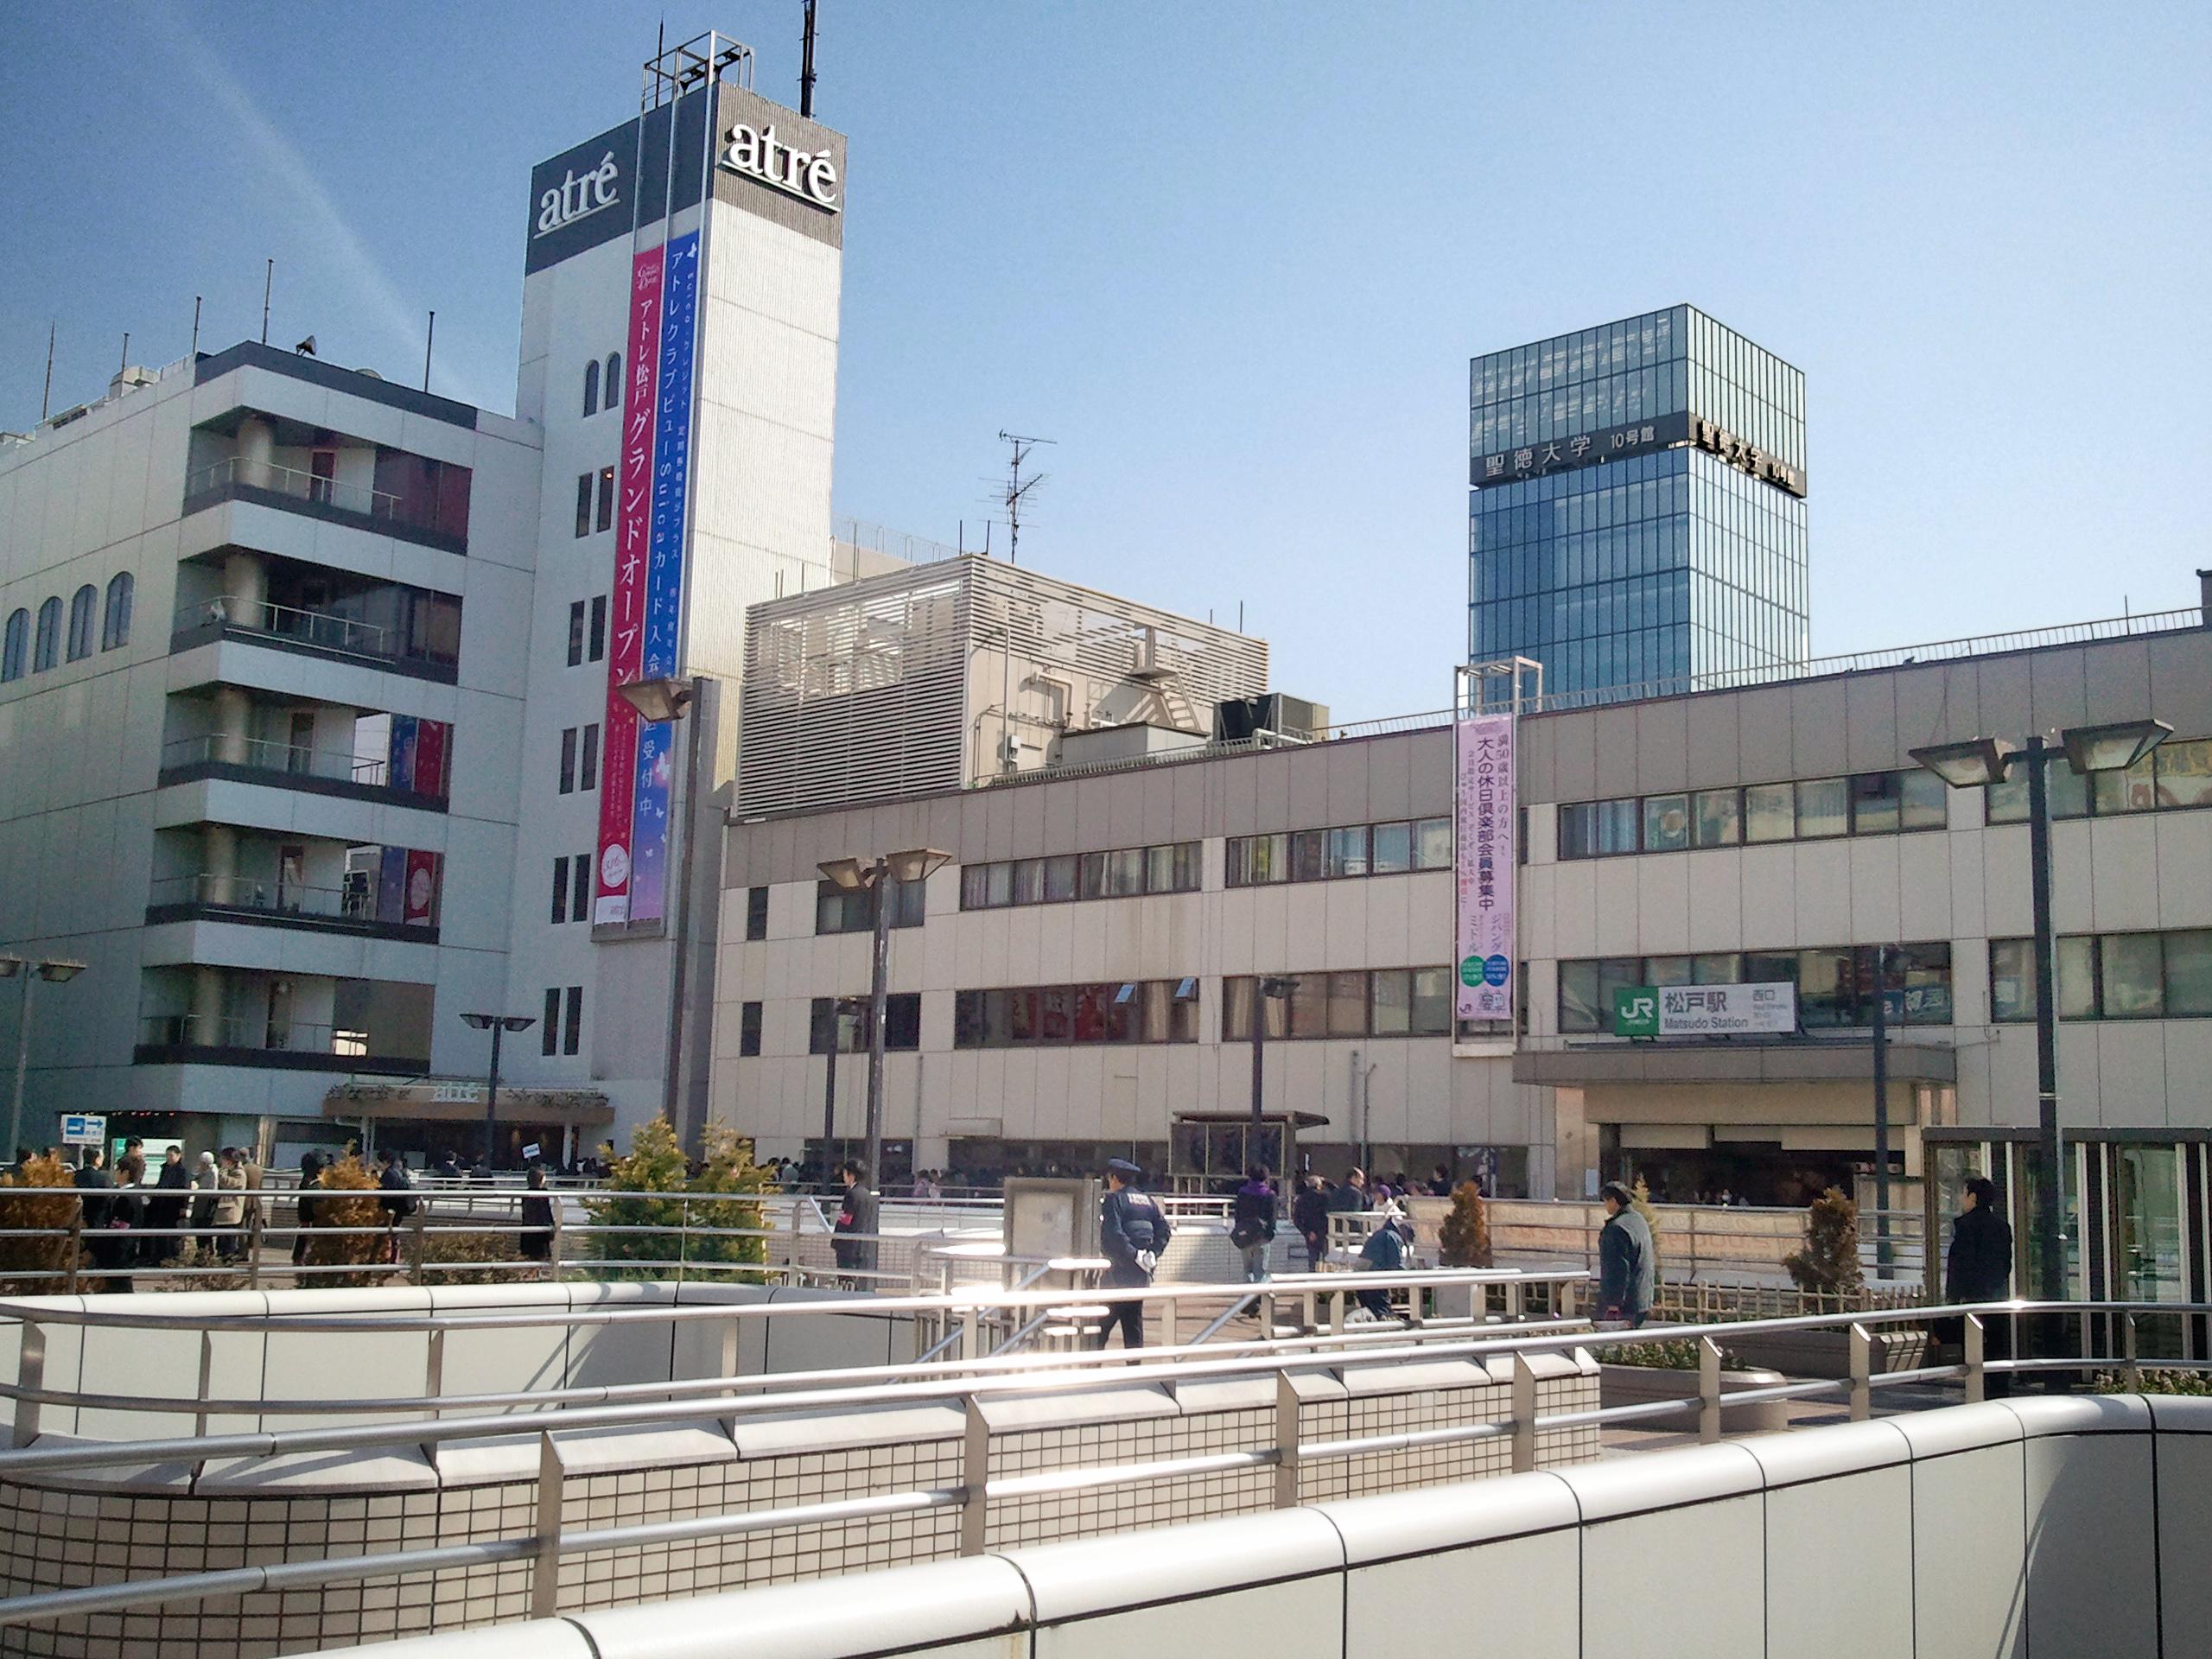 松戸駅 - Wikipedia